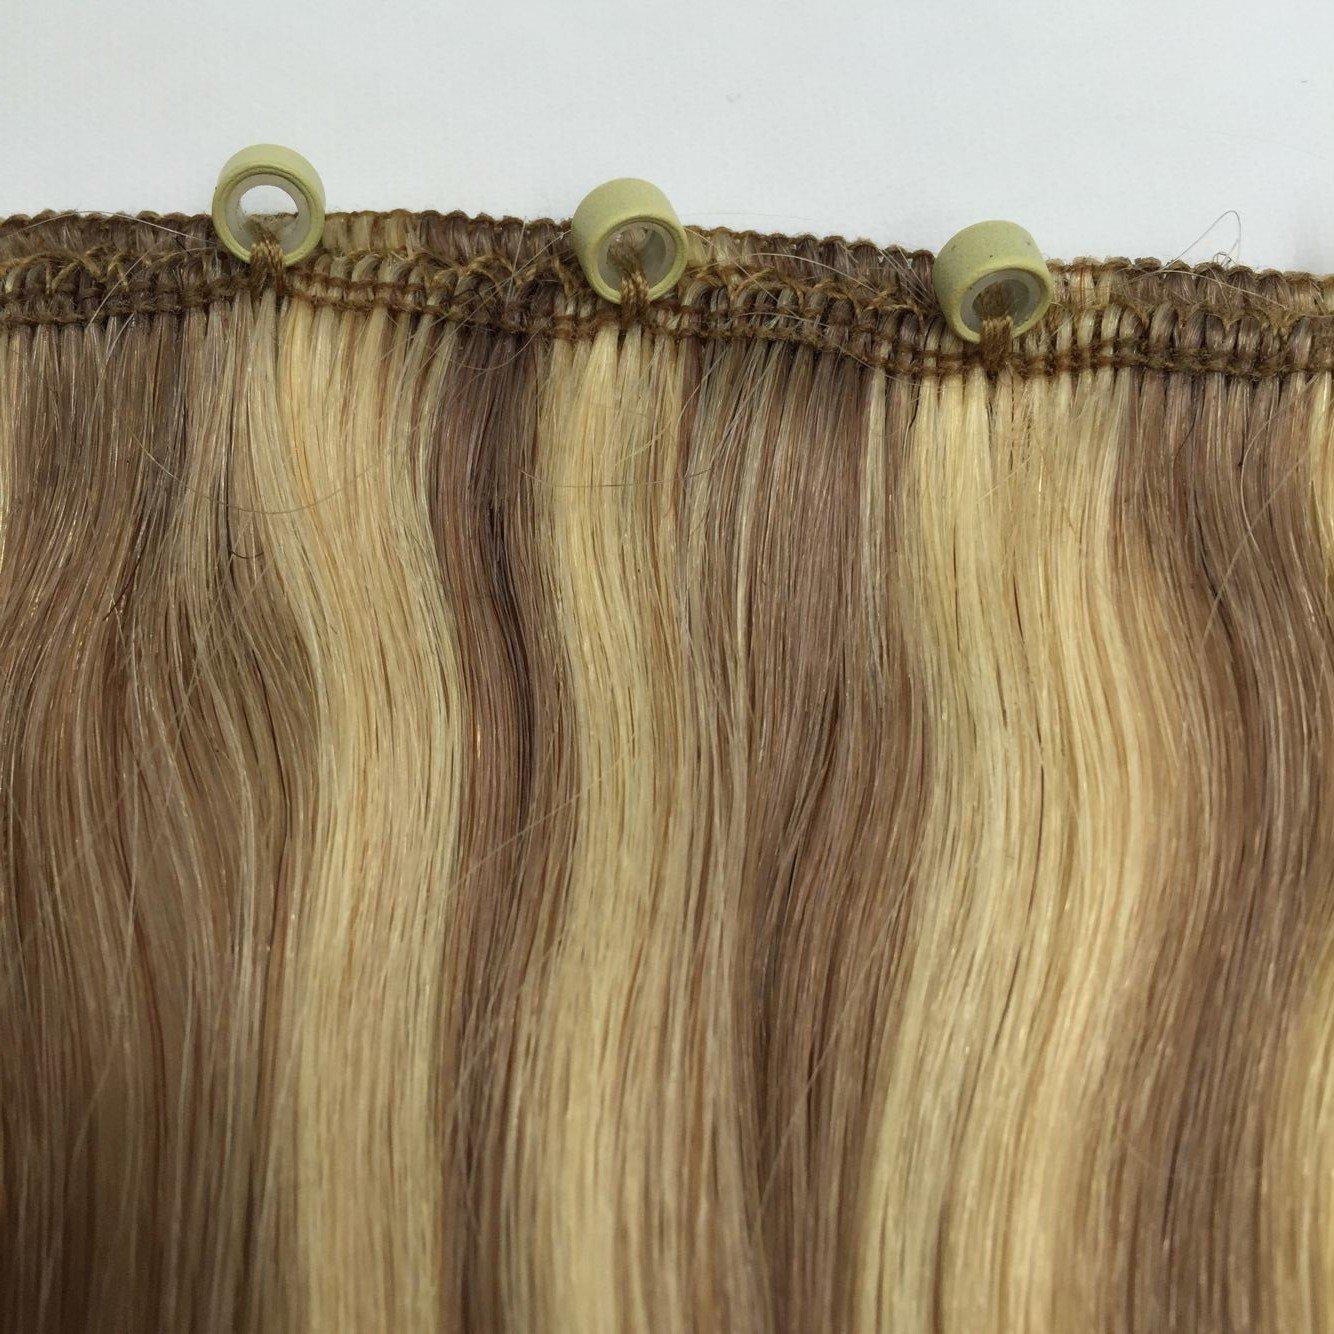 Amazon Sunny Micro Bead Weft Hair Extensionseze Weft16100